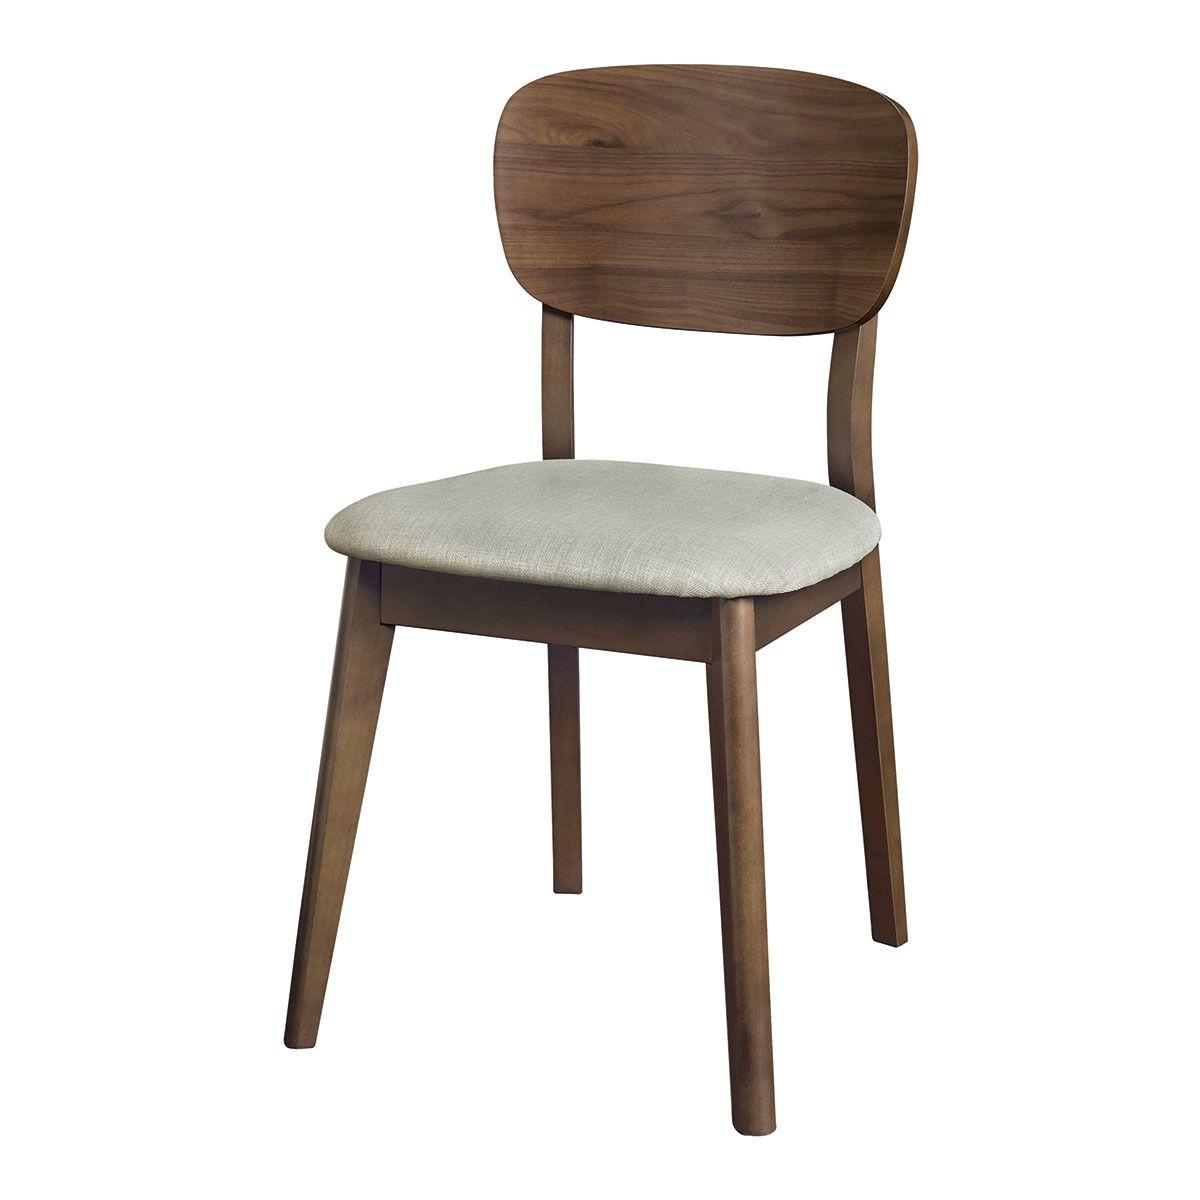 Sillas De Comedor El Corte Ingles Irdz Silla De Edor Tapizada Terra Restaurant Plates Dining Chairs